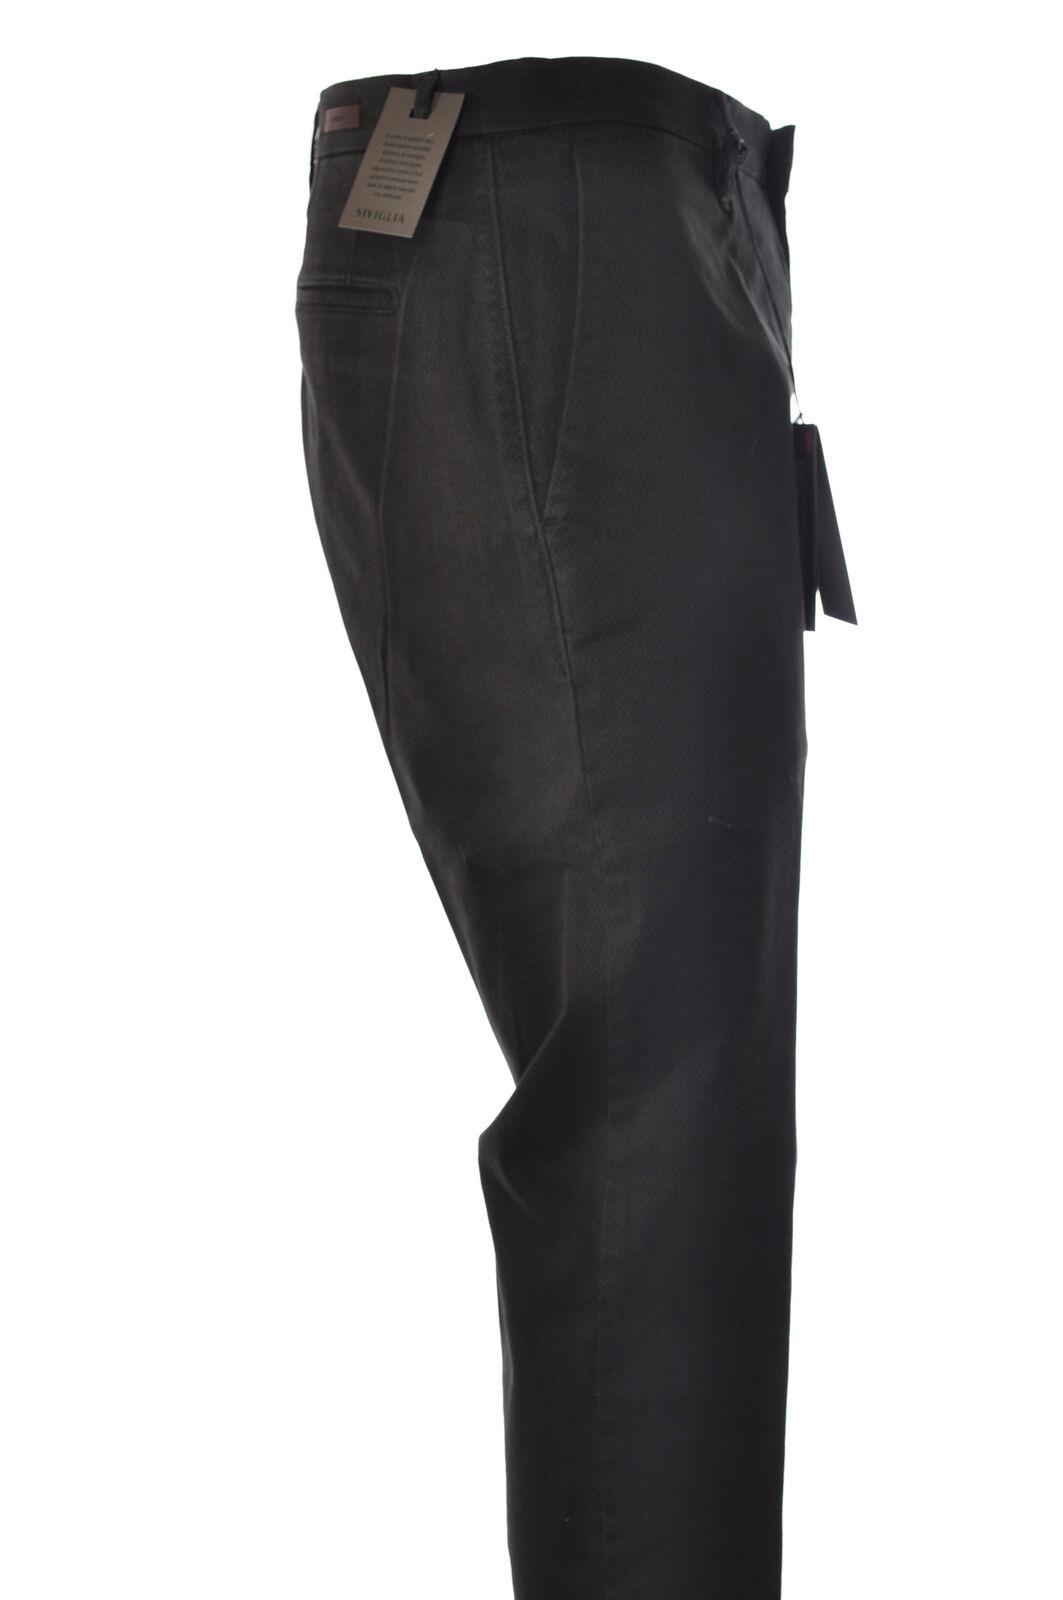 Siviglia - Pants-Pants - Man - Green - 2682706C192742